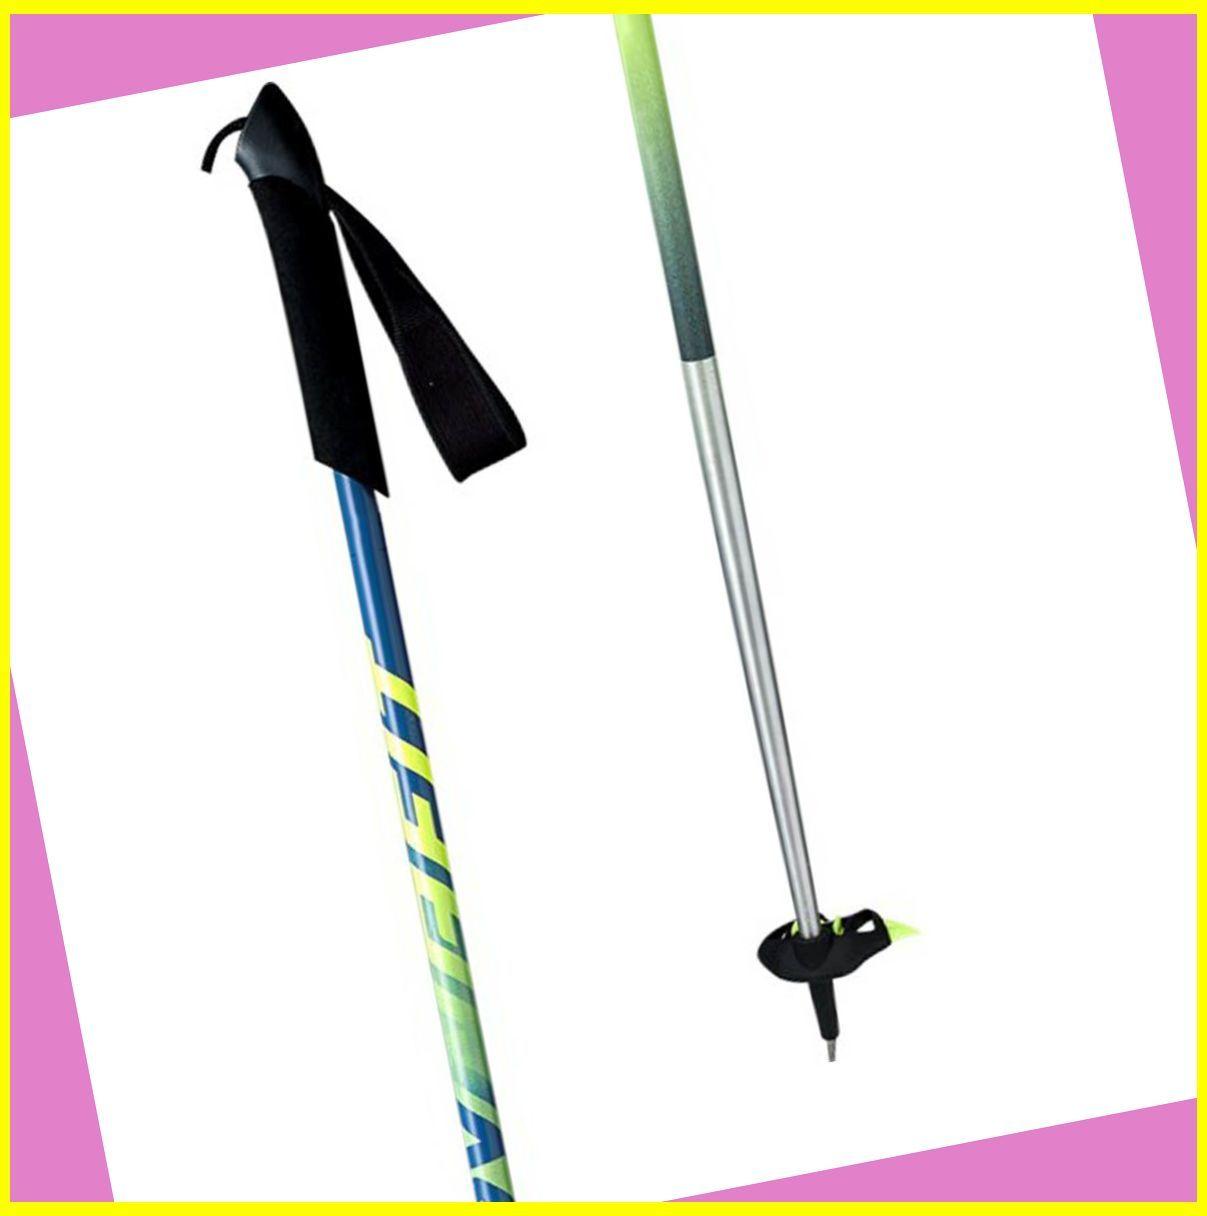 Speed Ski Poles Butterfly Golf Grip Golf Grips For Women Golf Grip Interlocking Bioki In 2020 Golf Grip Golf Swing Ski Poles